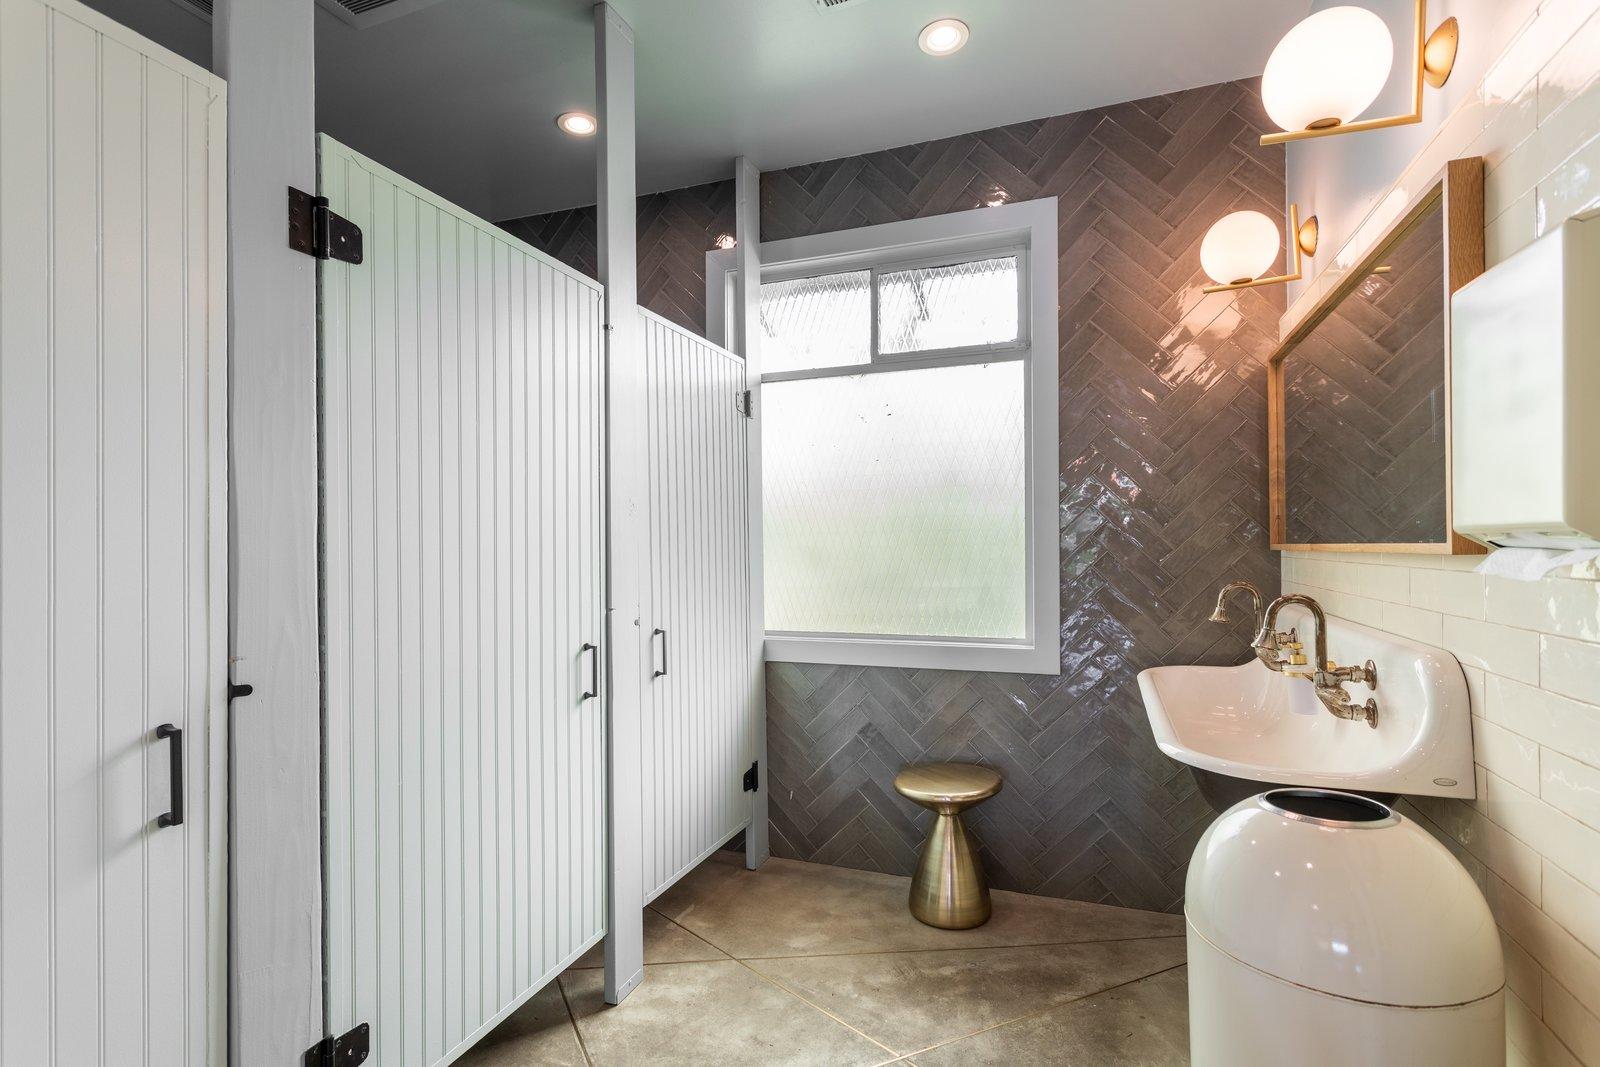 The Ruby Street bathroom